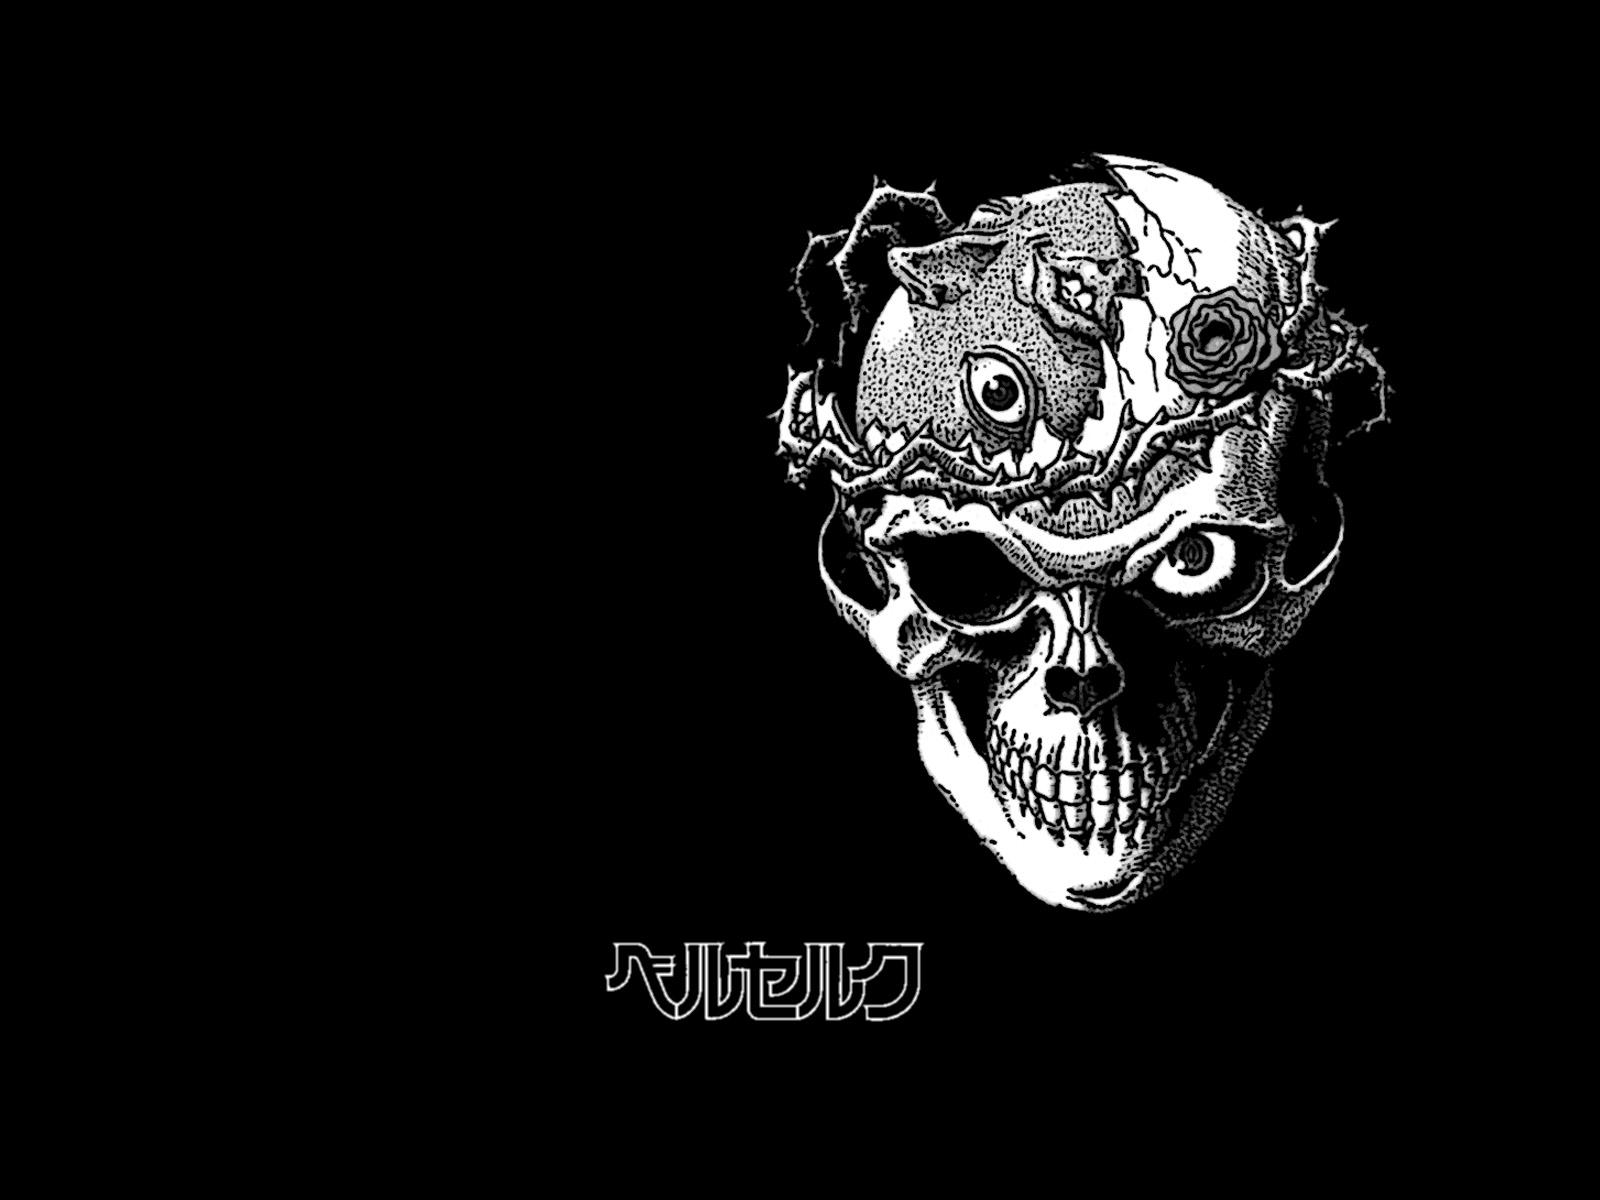 Cool Skull Logos With Guns Skull Wallpaper and Ba...